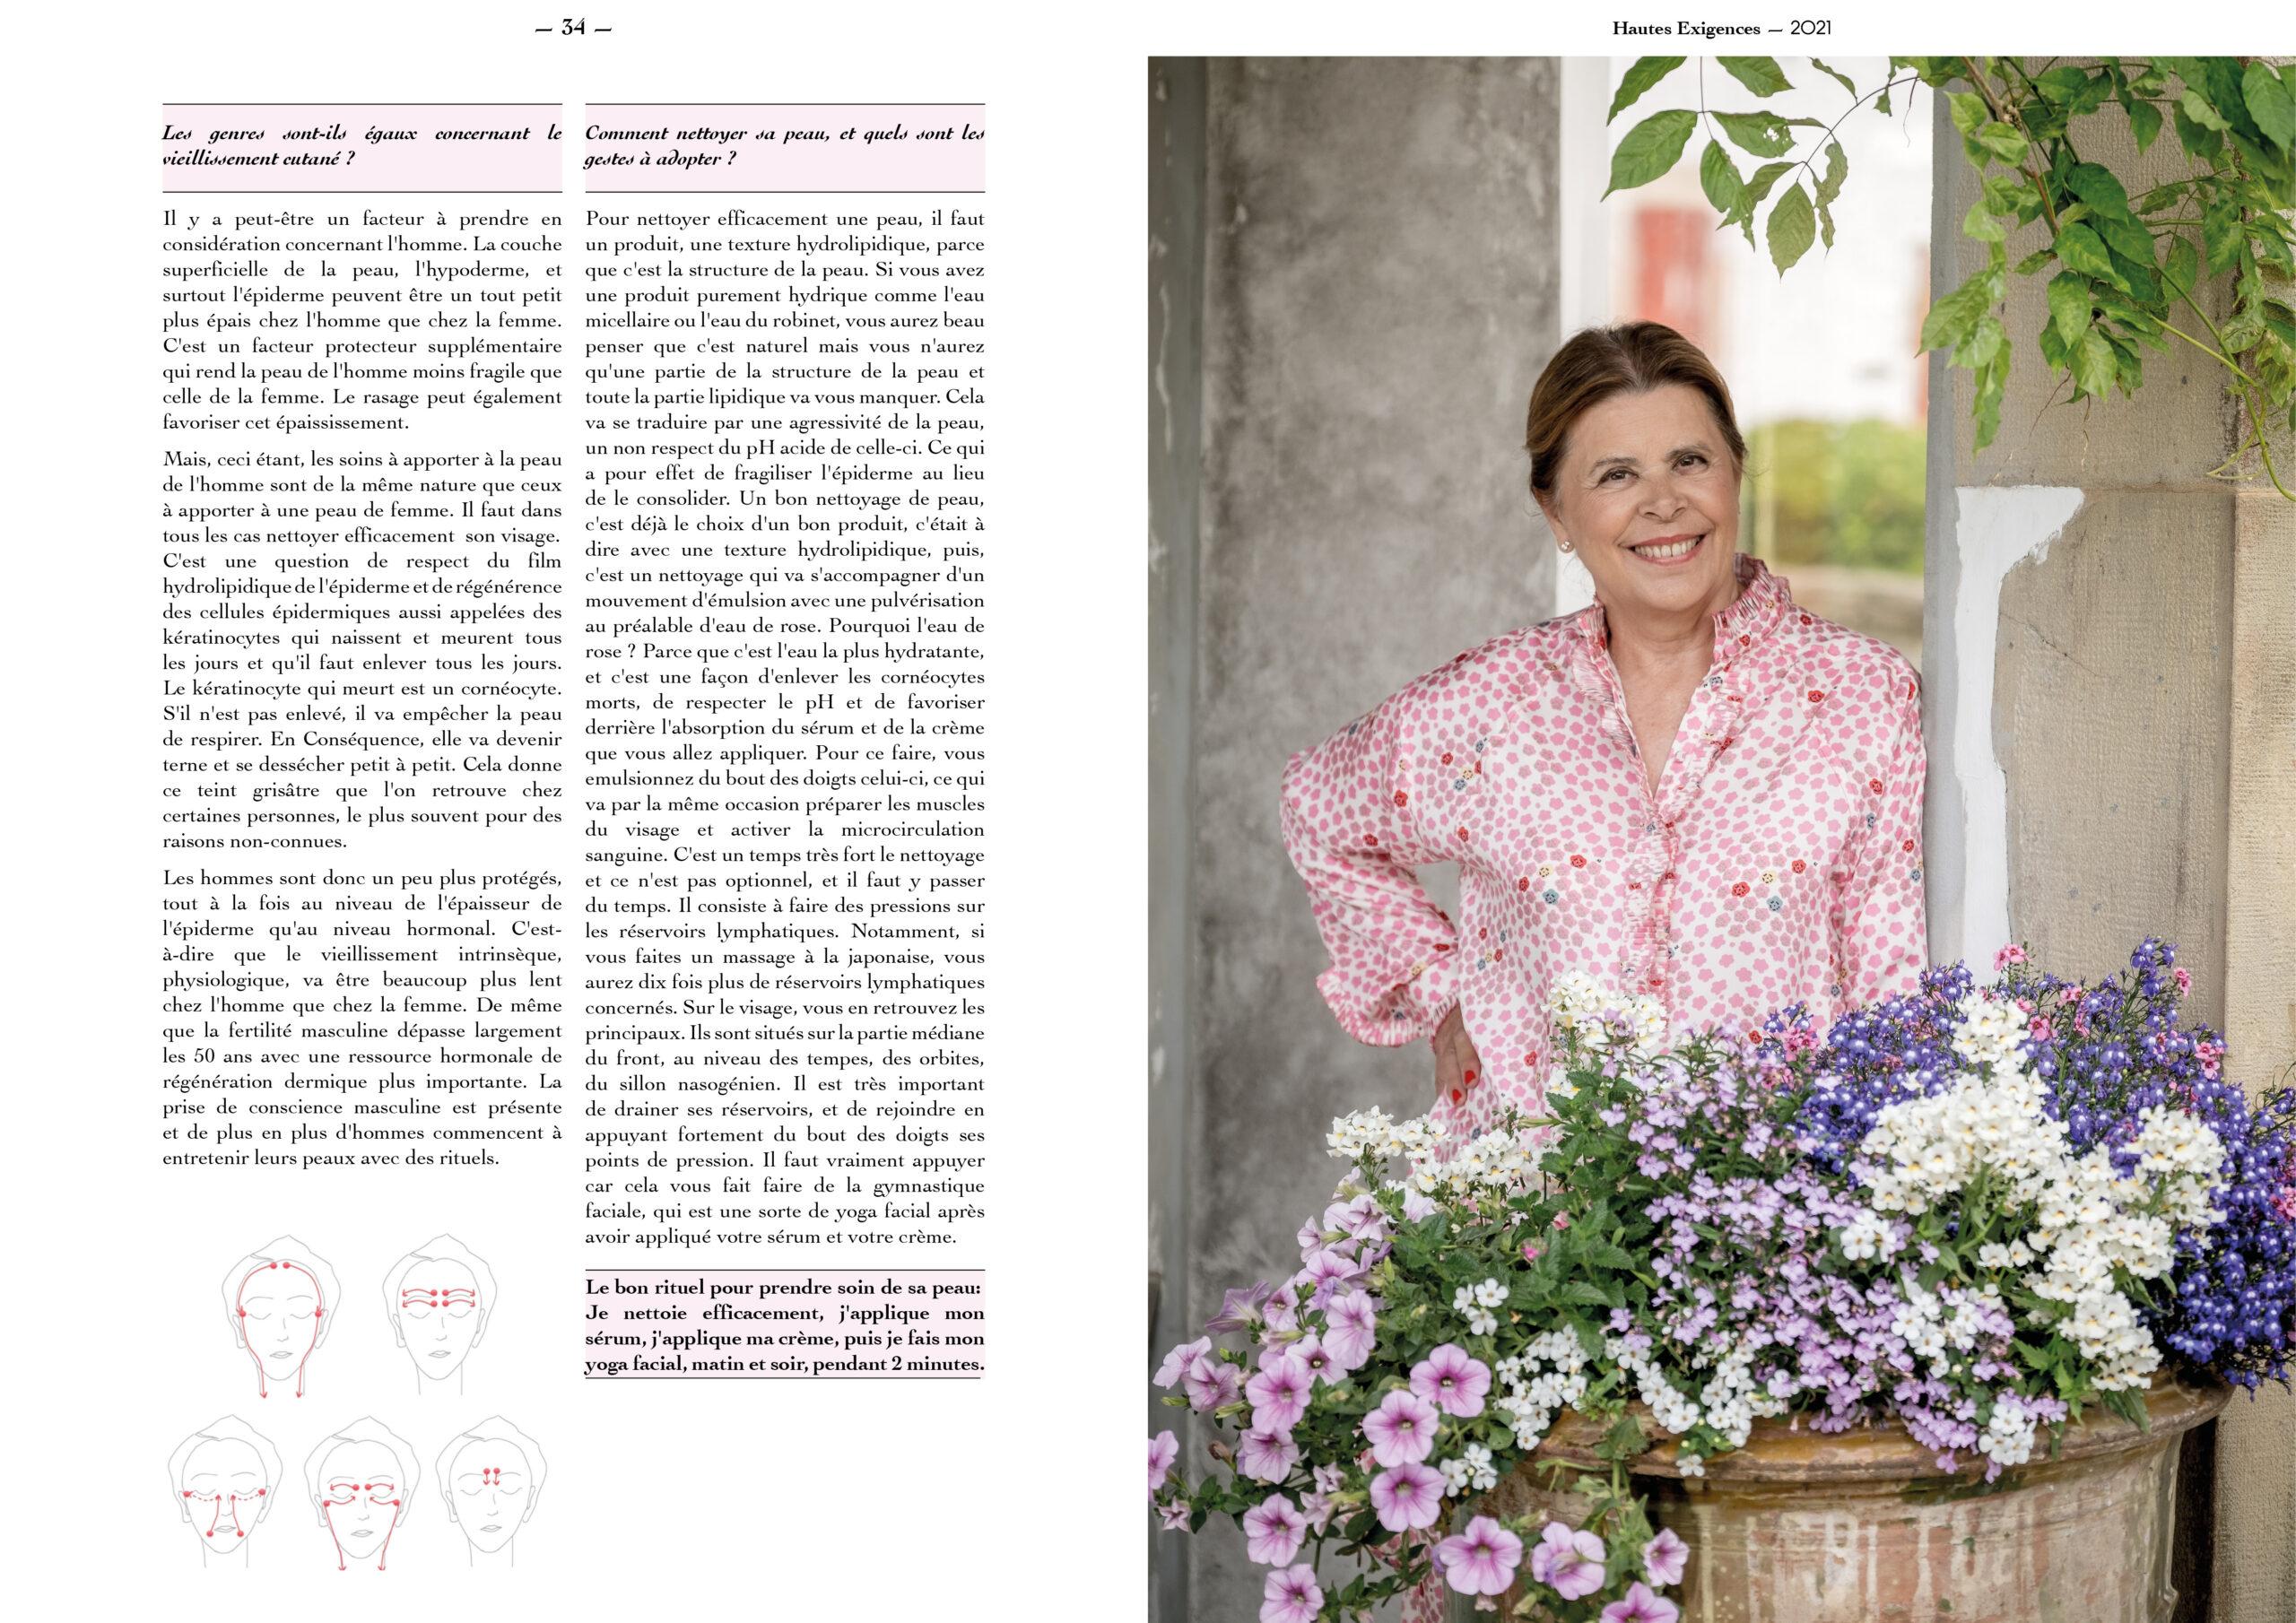 Hautes Exigences Magazine Hors Serie 2021 page 34-35